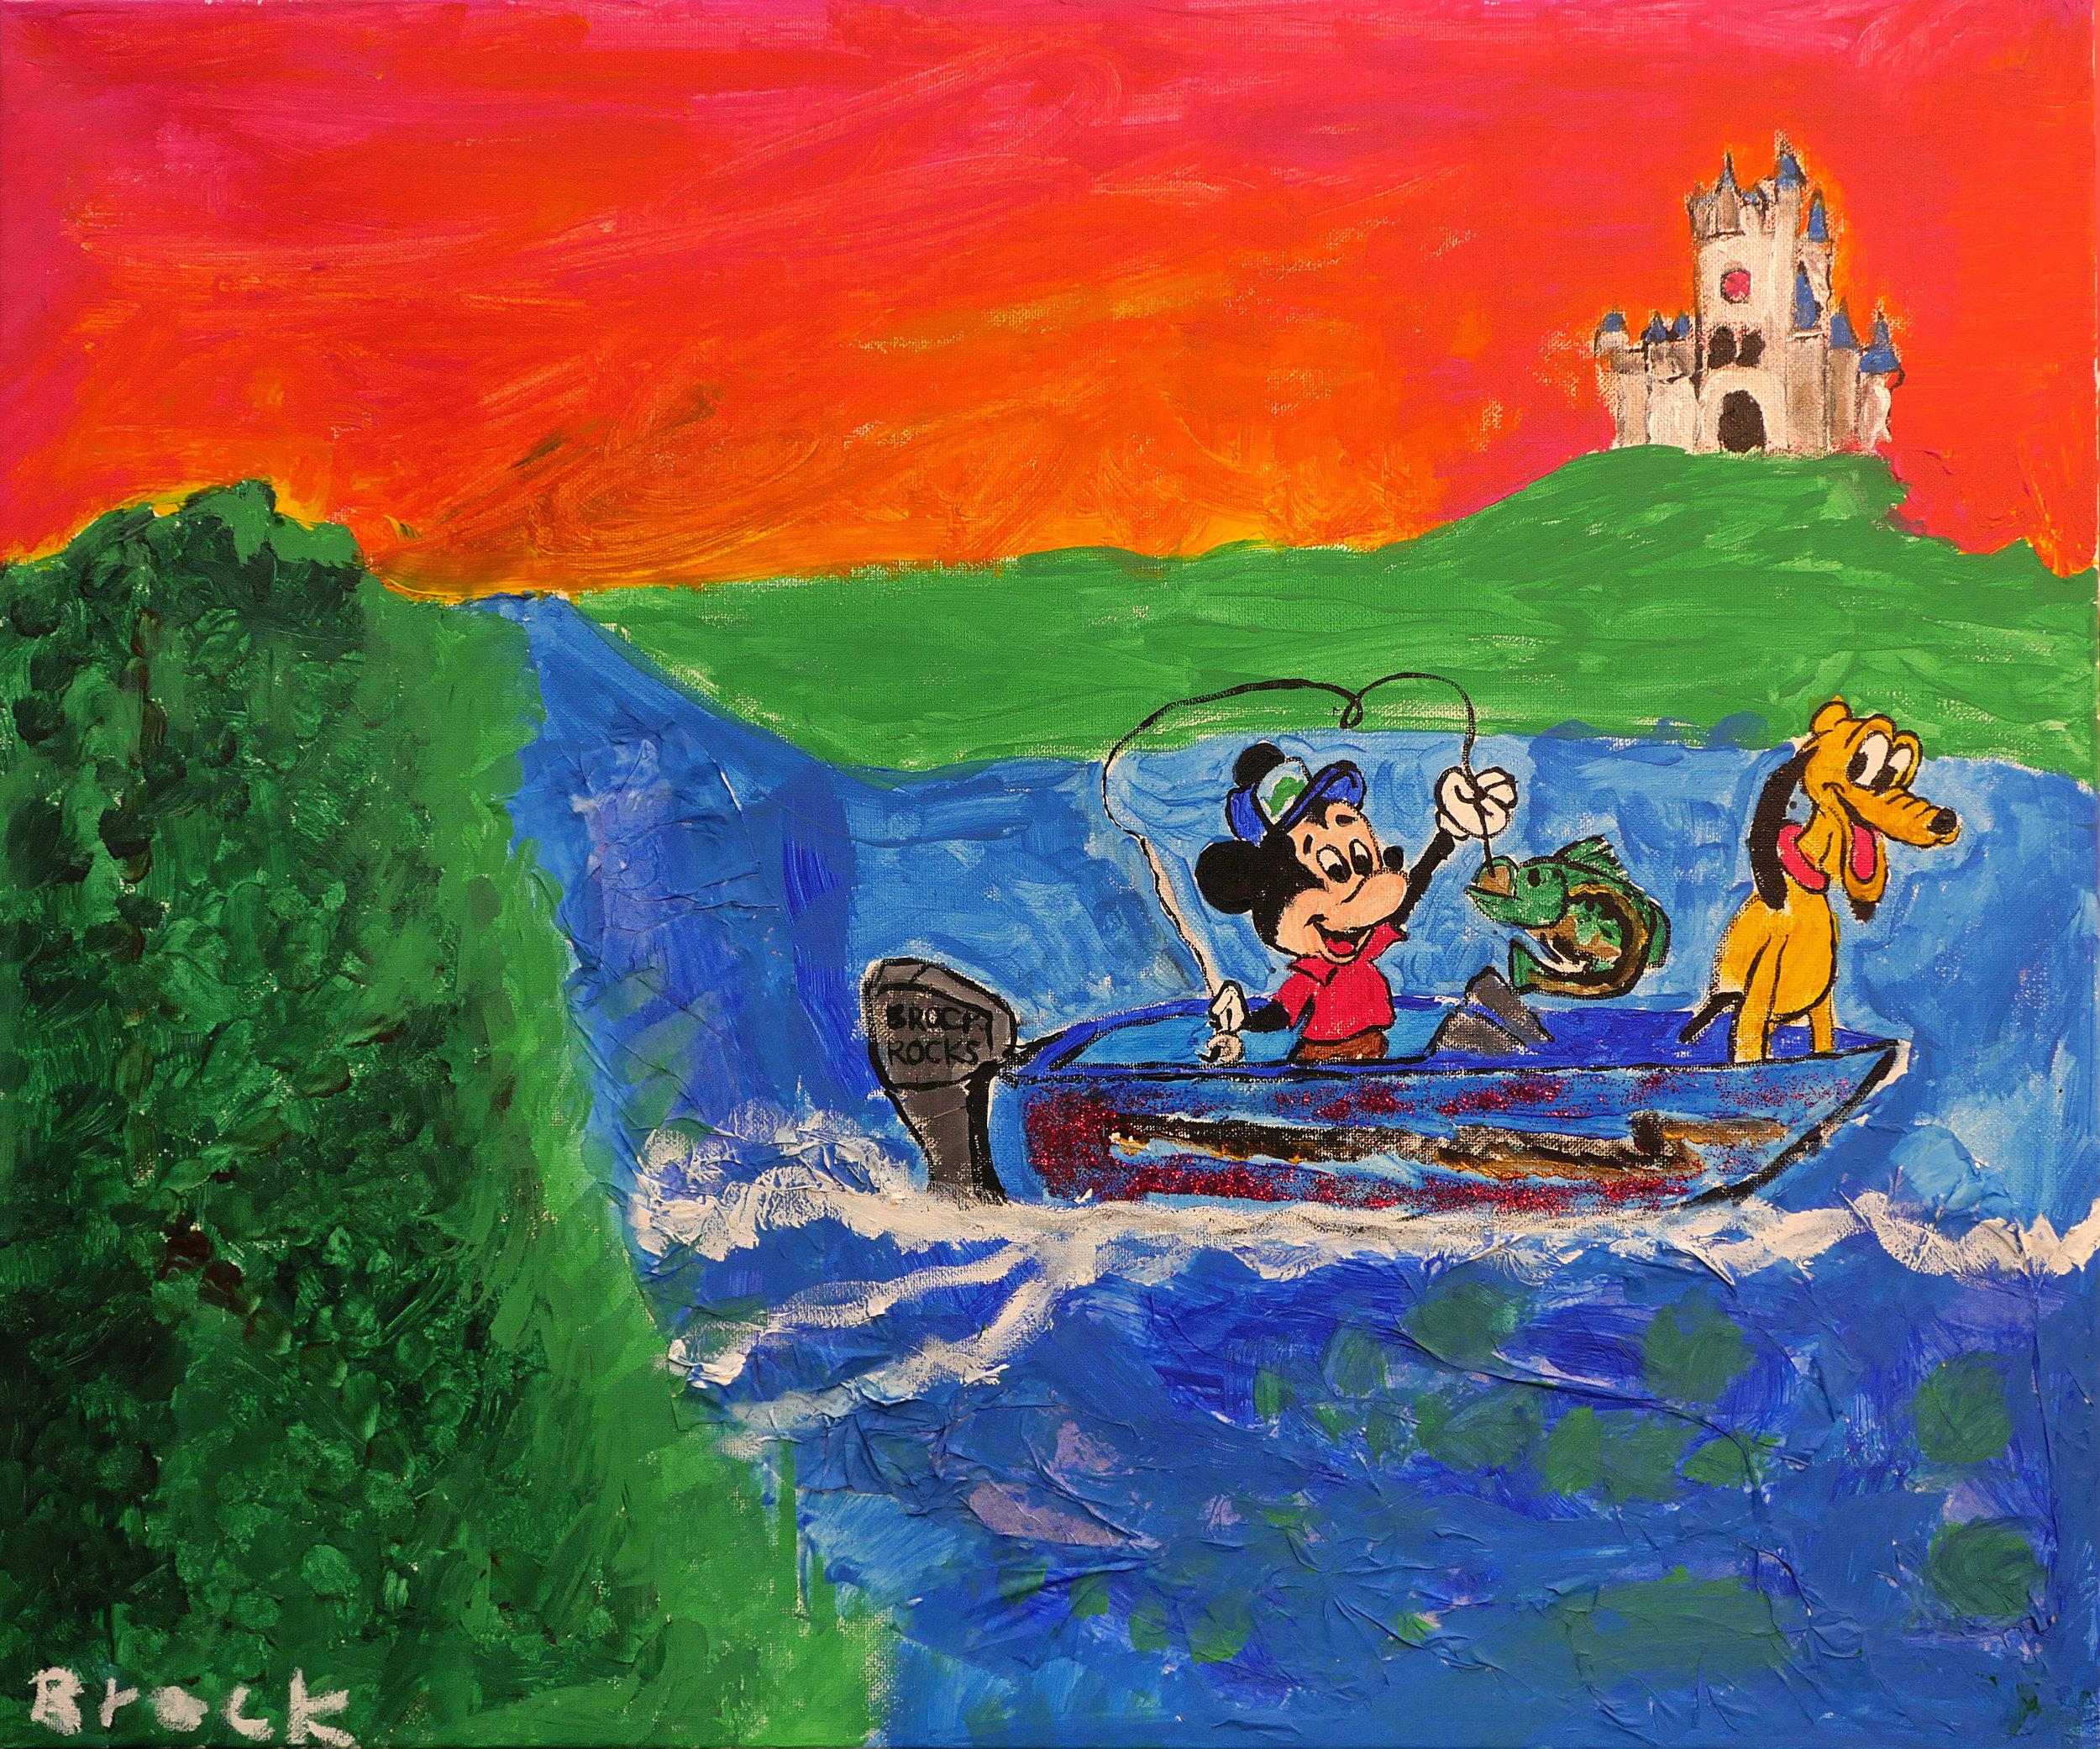 Brock_Mickey'sMagicalAdventure.JPG